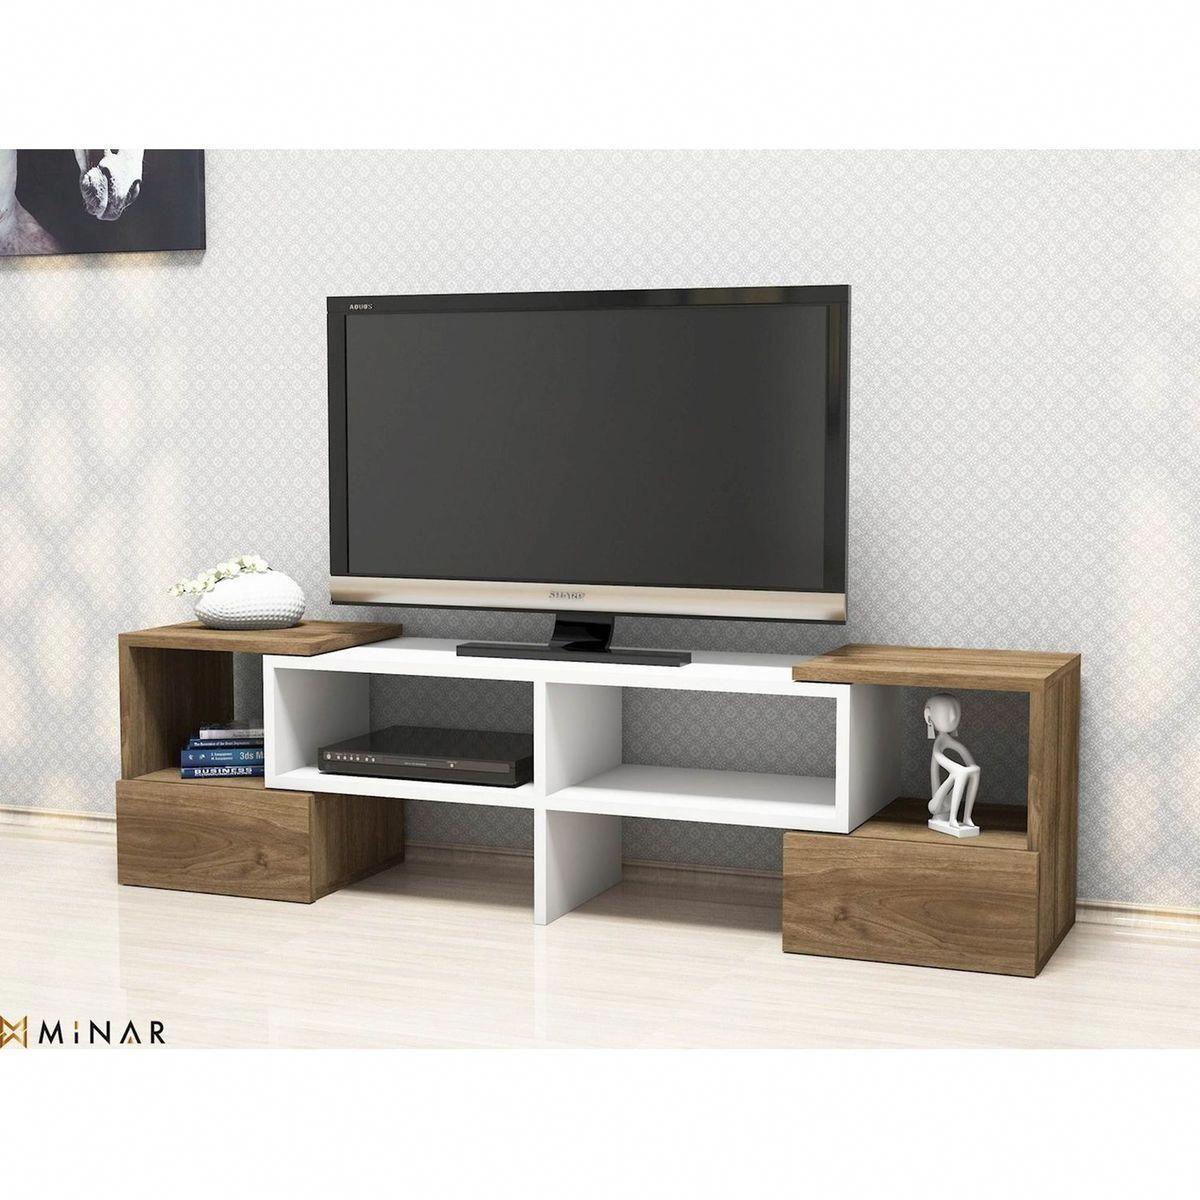 Lexington Tv Kast.Tv Stands In Black Furniturebandung Tvstand Tv Unit Furniture